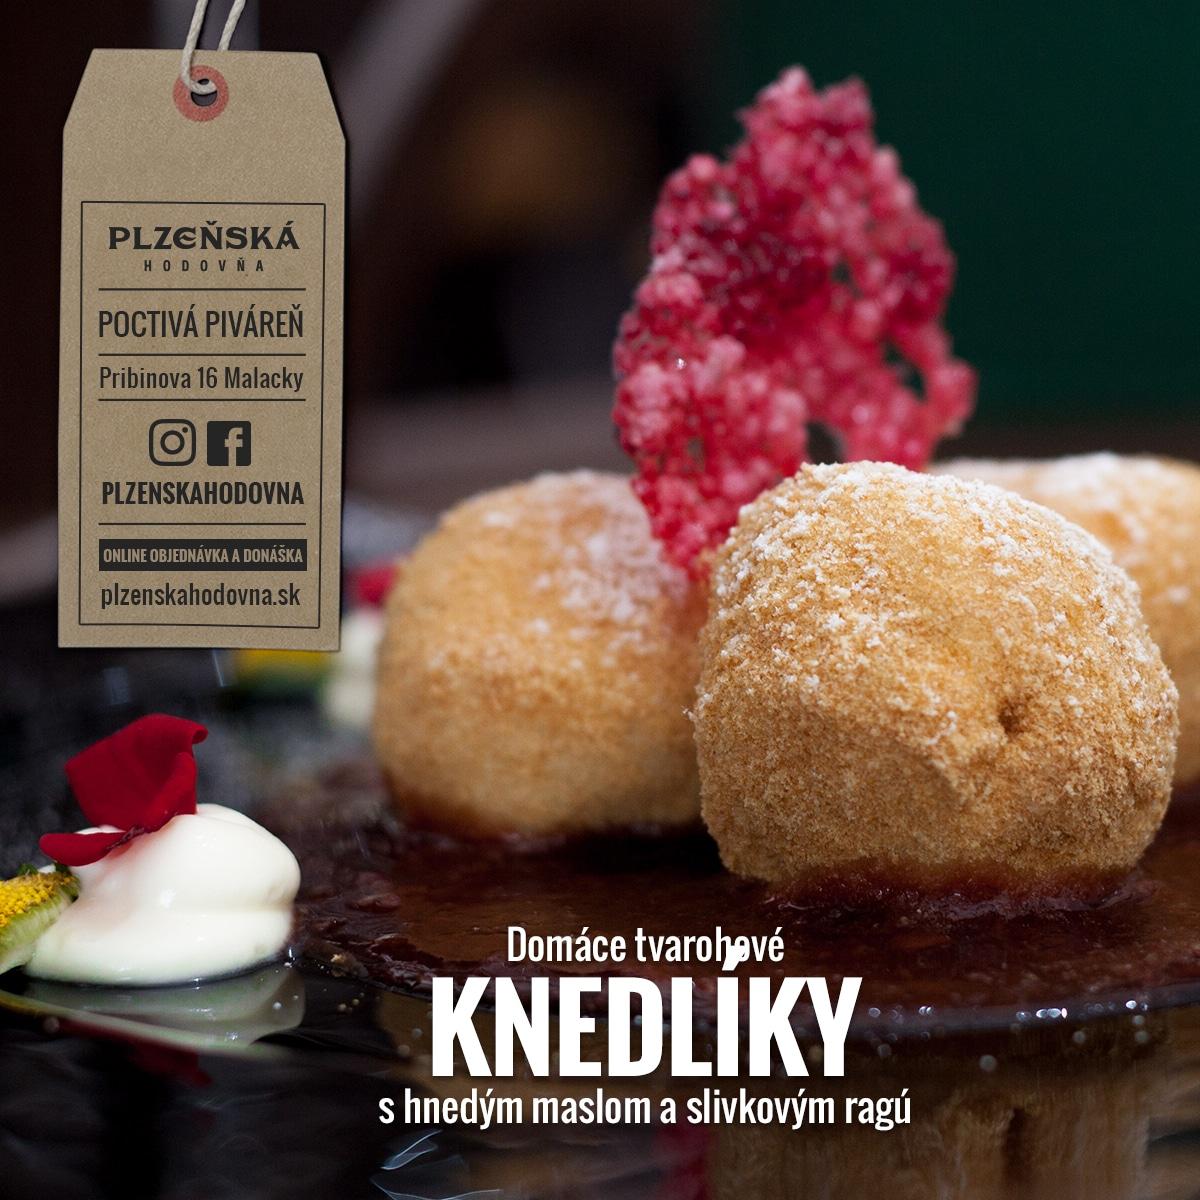 PH.knedliky.1200